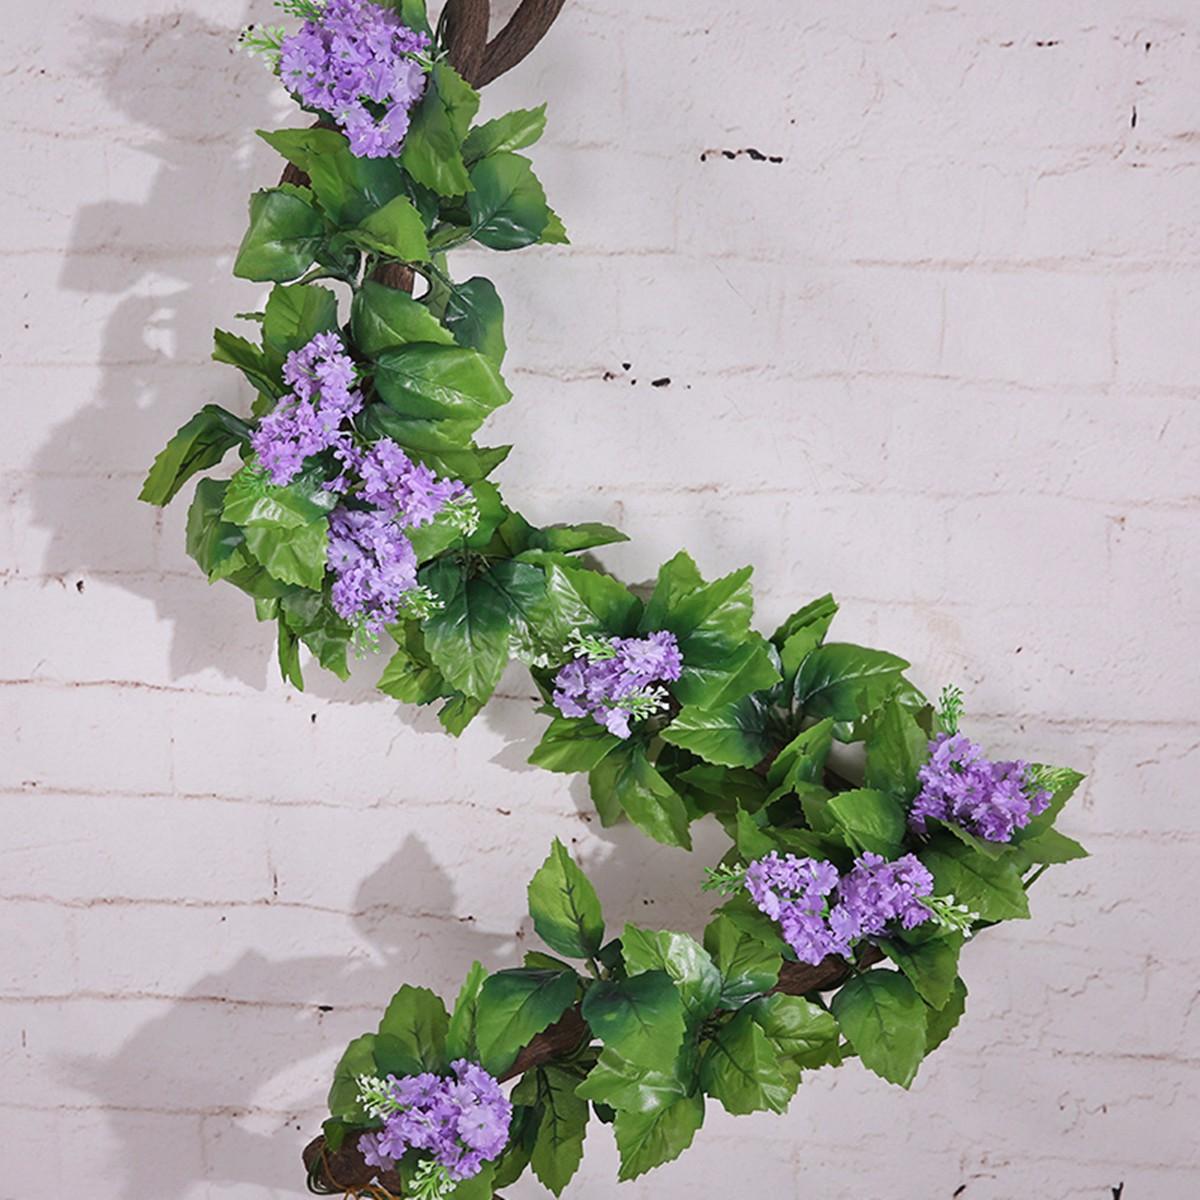 artificial fake silk flower garland artificial vine ivy home wedding garden deco ebay. Black Bedroom Furniture Sets. Home Design Ideas